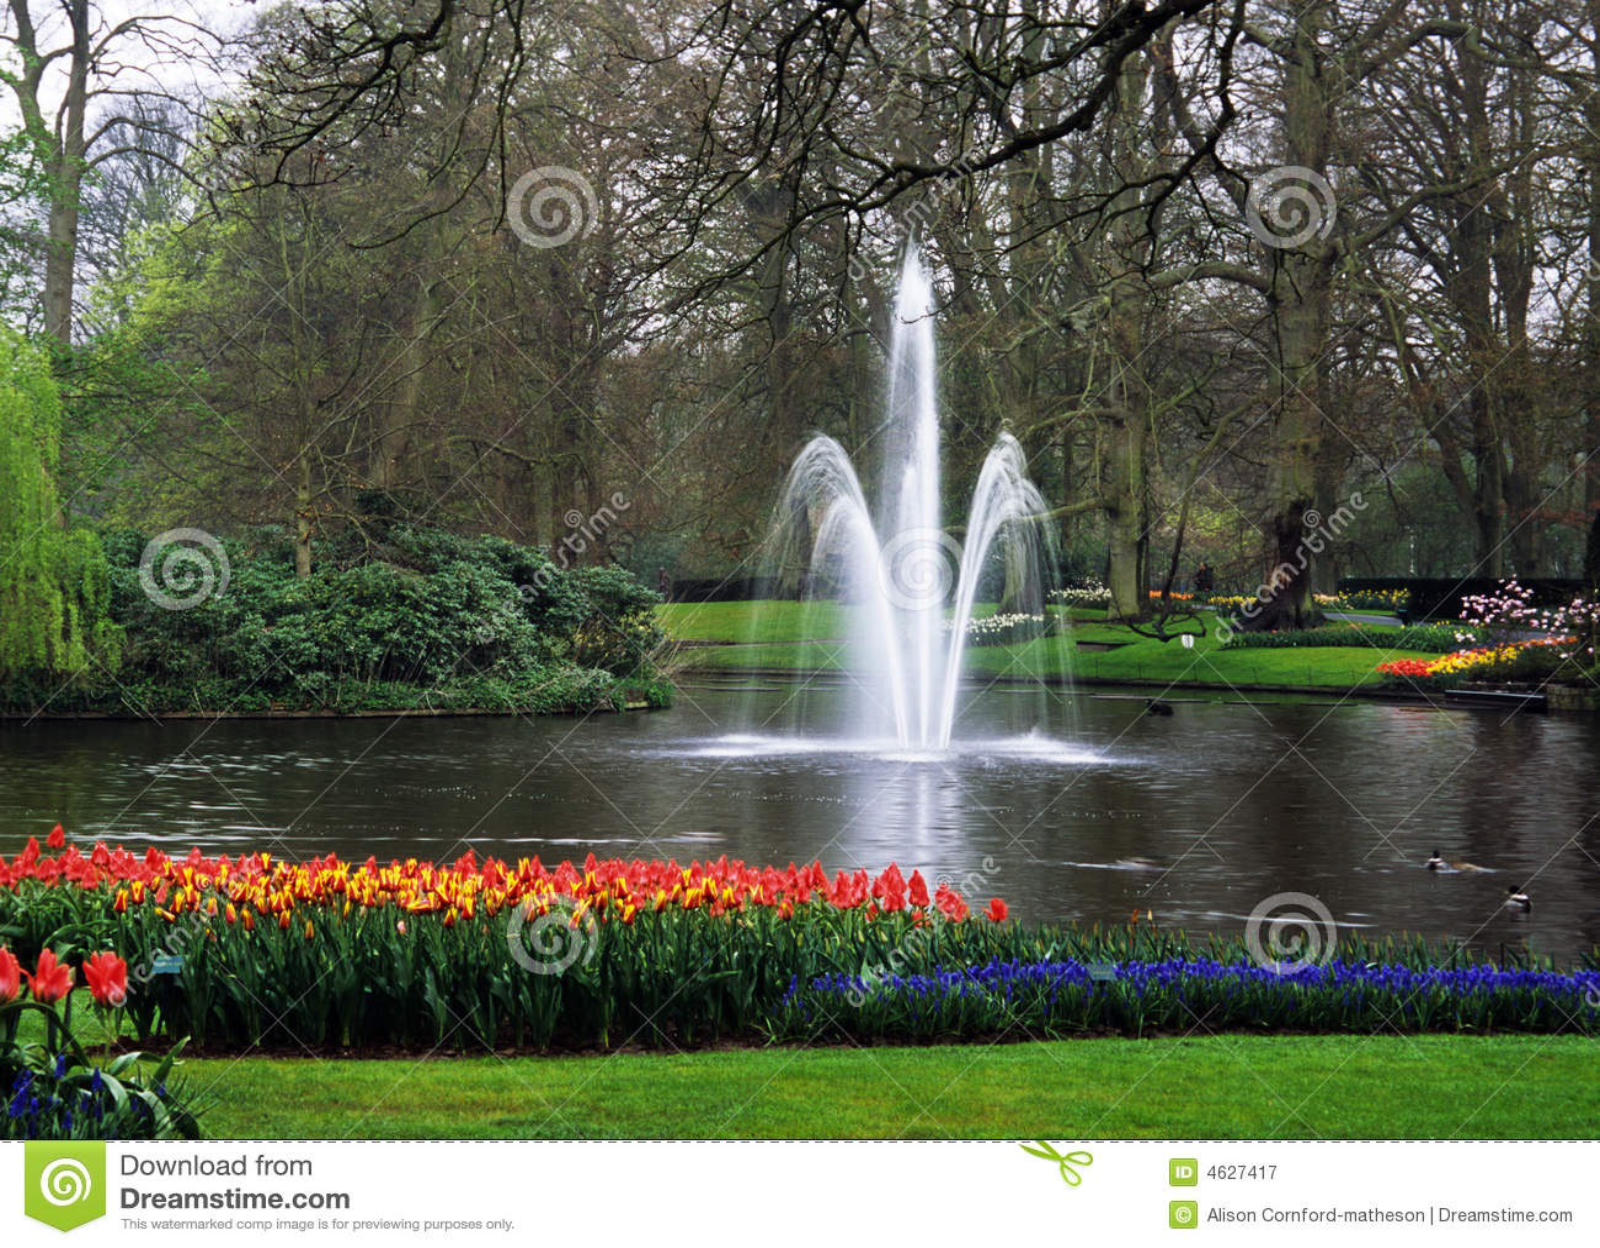 Keukenhof Gardens Fountain